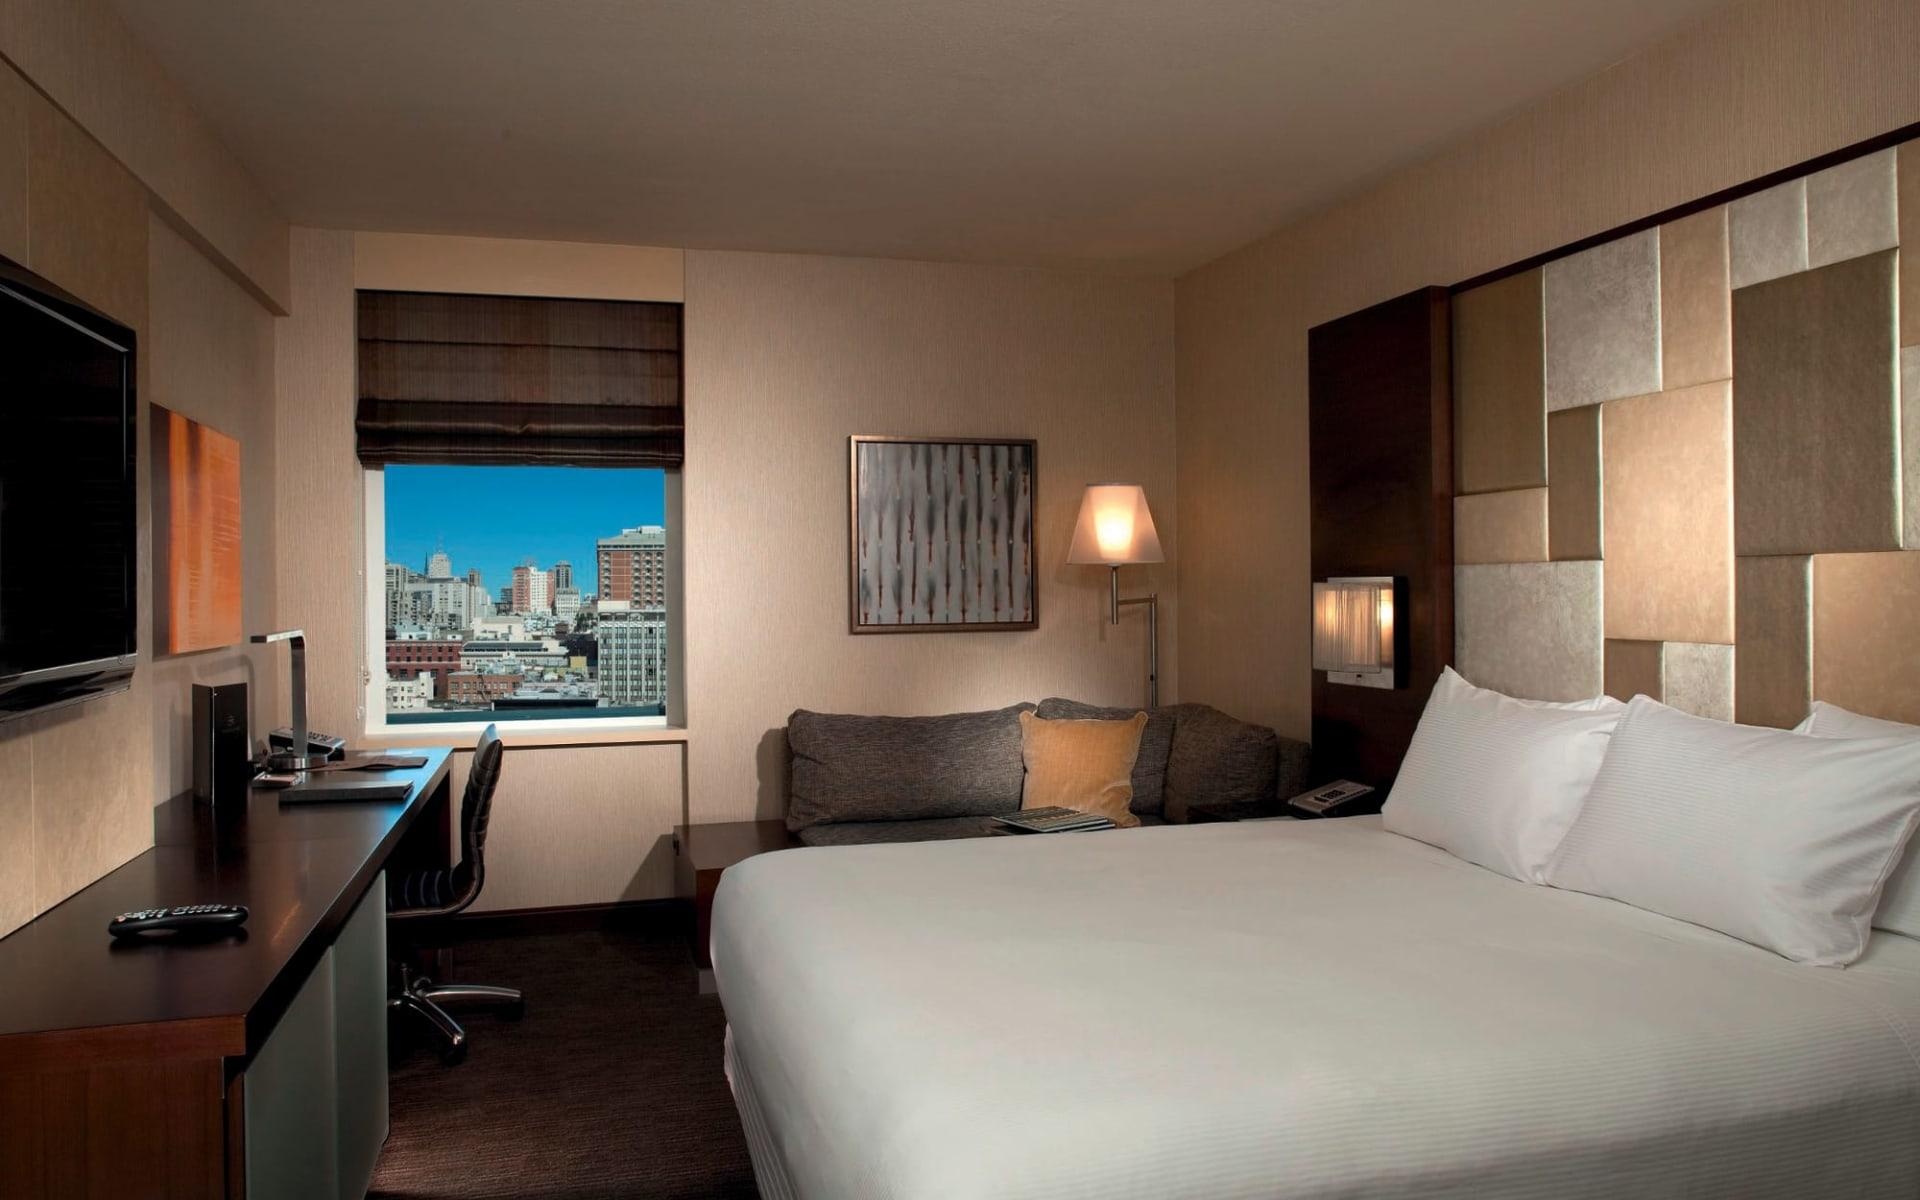 Hilton San Francisco Union Square: zimmer hilton san francisco union square doppelzimmer